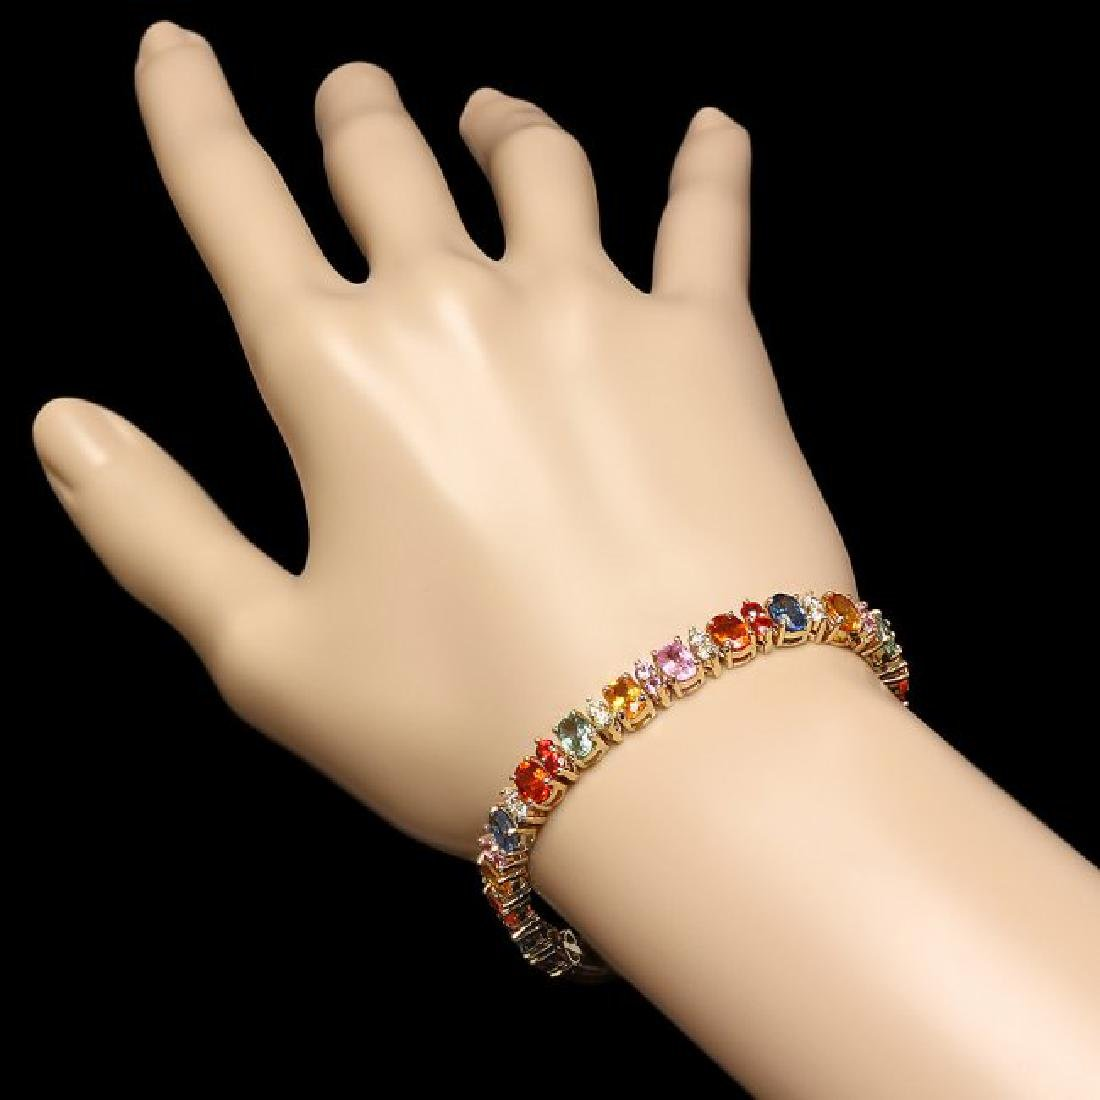 14k Gold 20ct Sapphire 1.35ct Diamond Bracelet - 4